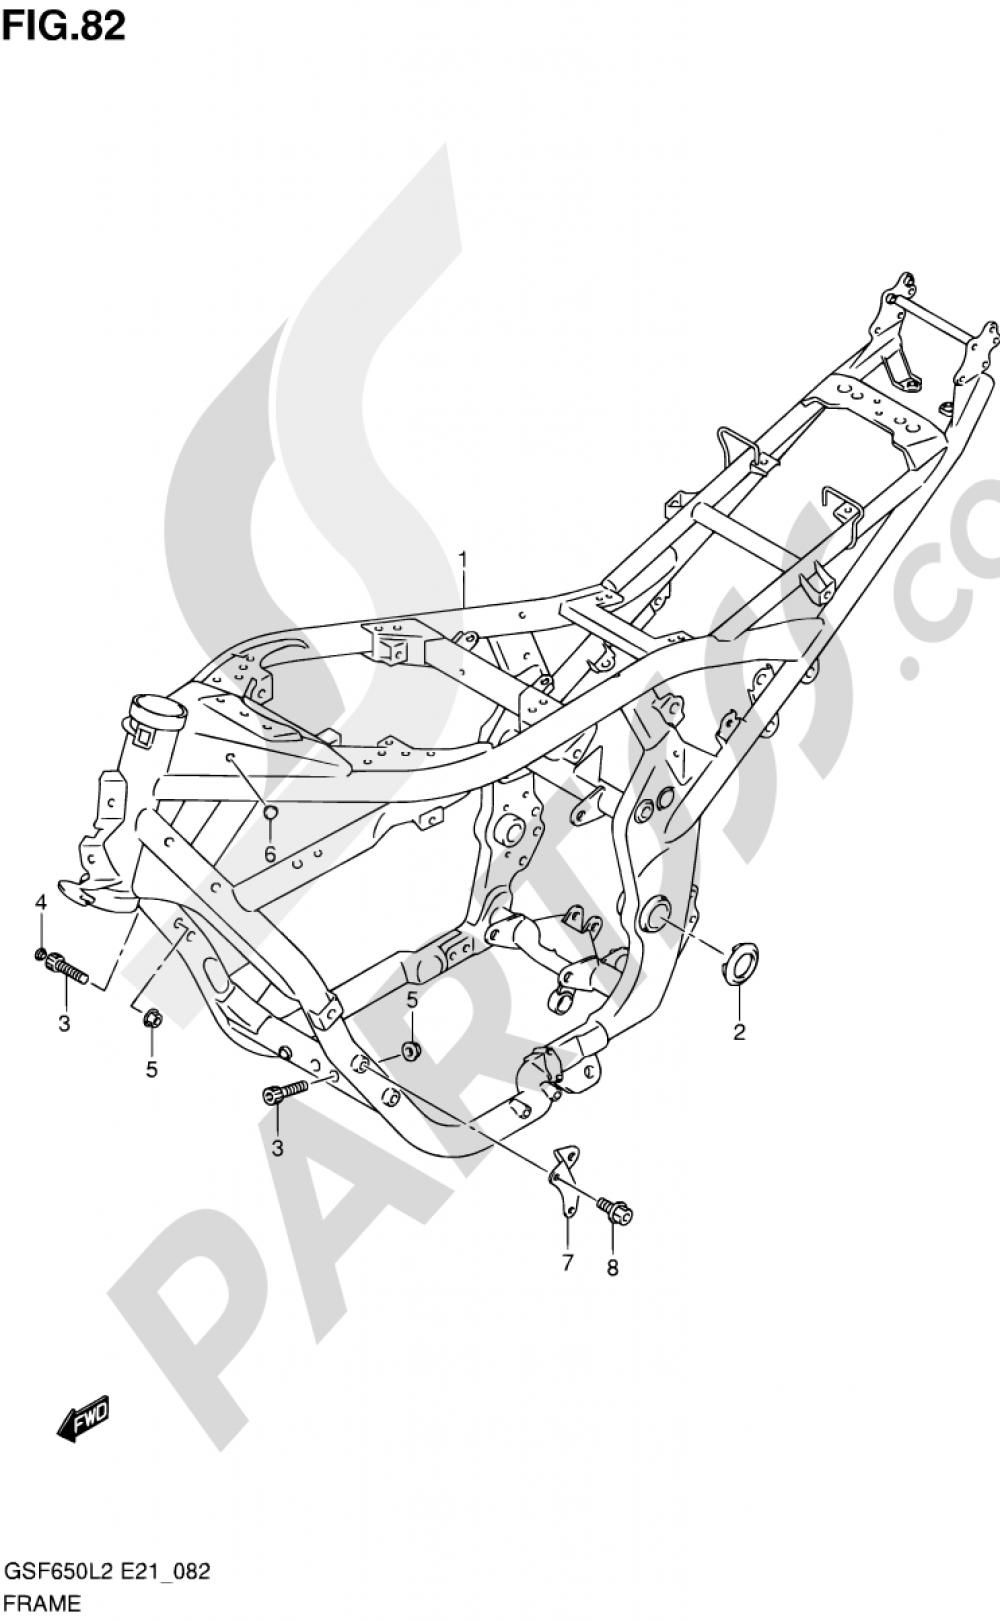 82 - FRAME (GSF650SAL2 E21) Suzuki BANDIT GSF650S 2012